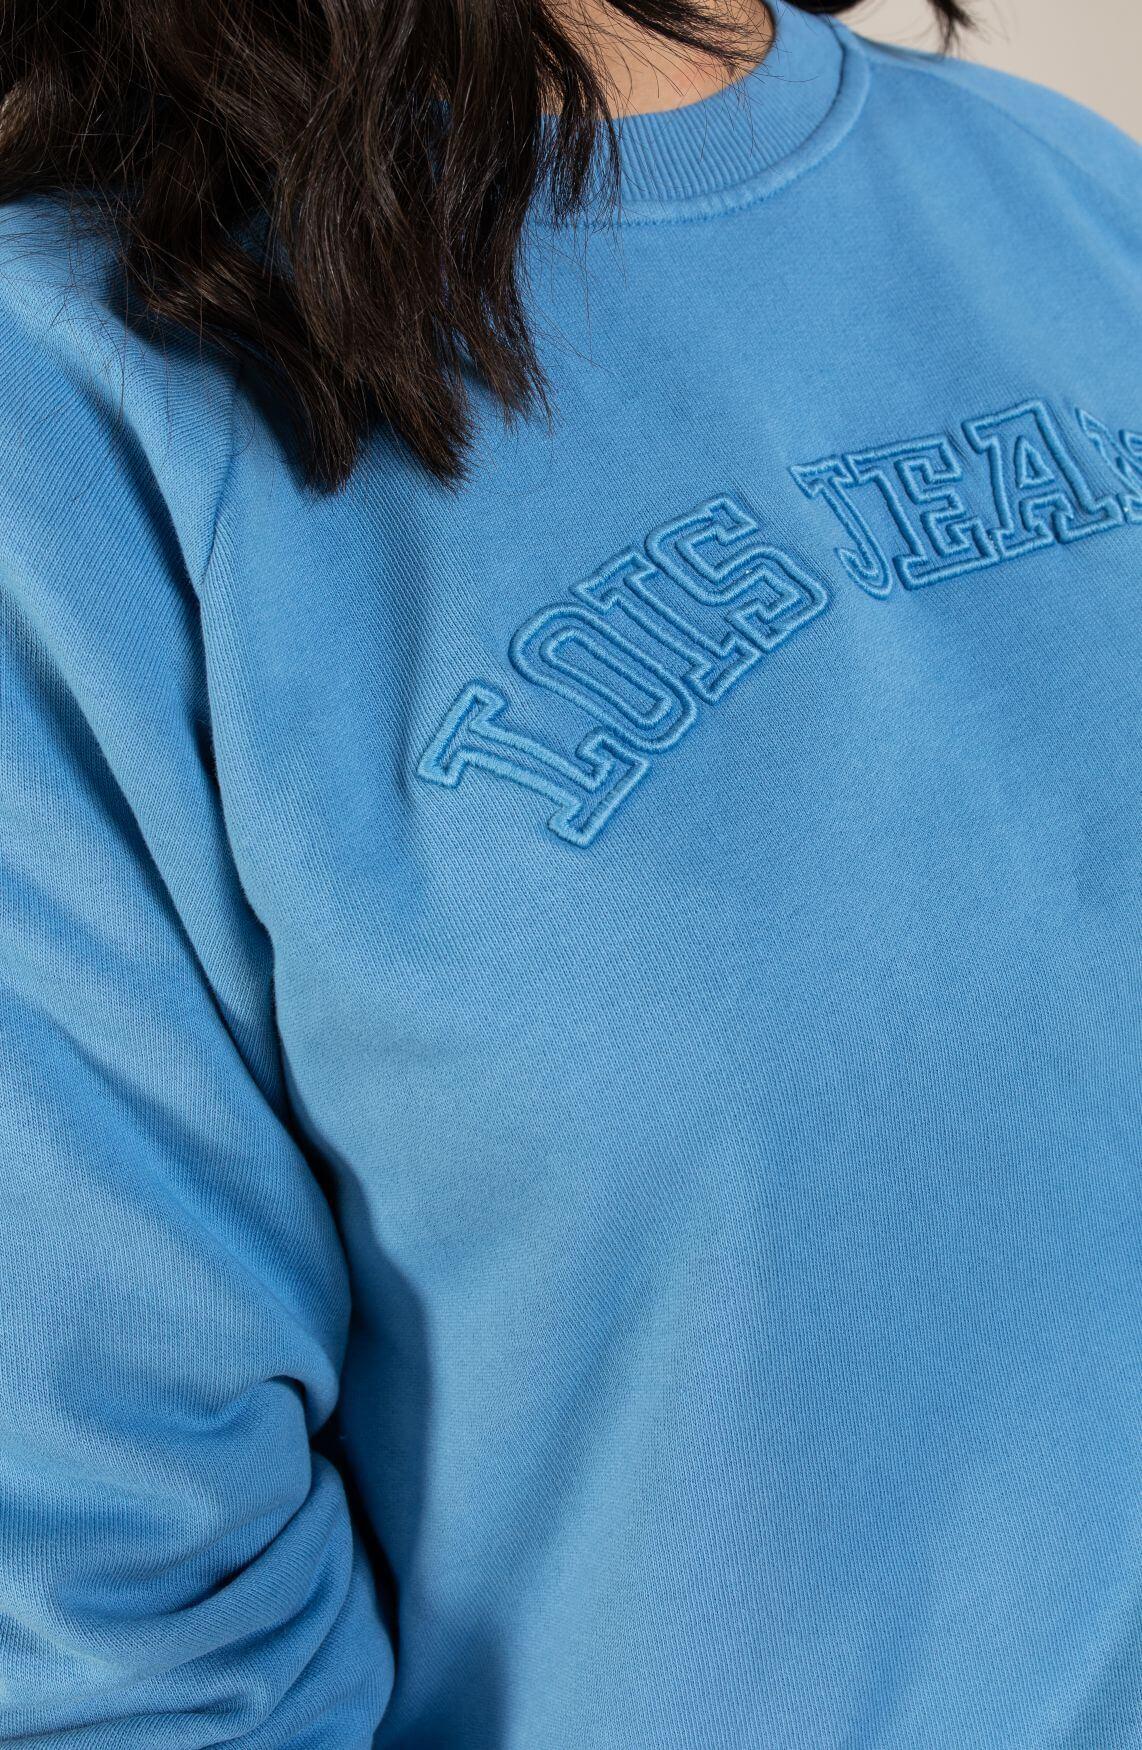 Lois Dames Oversized pullover met logo Blauw